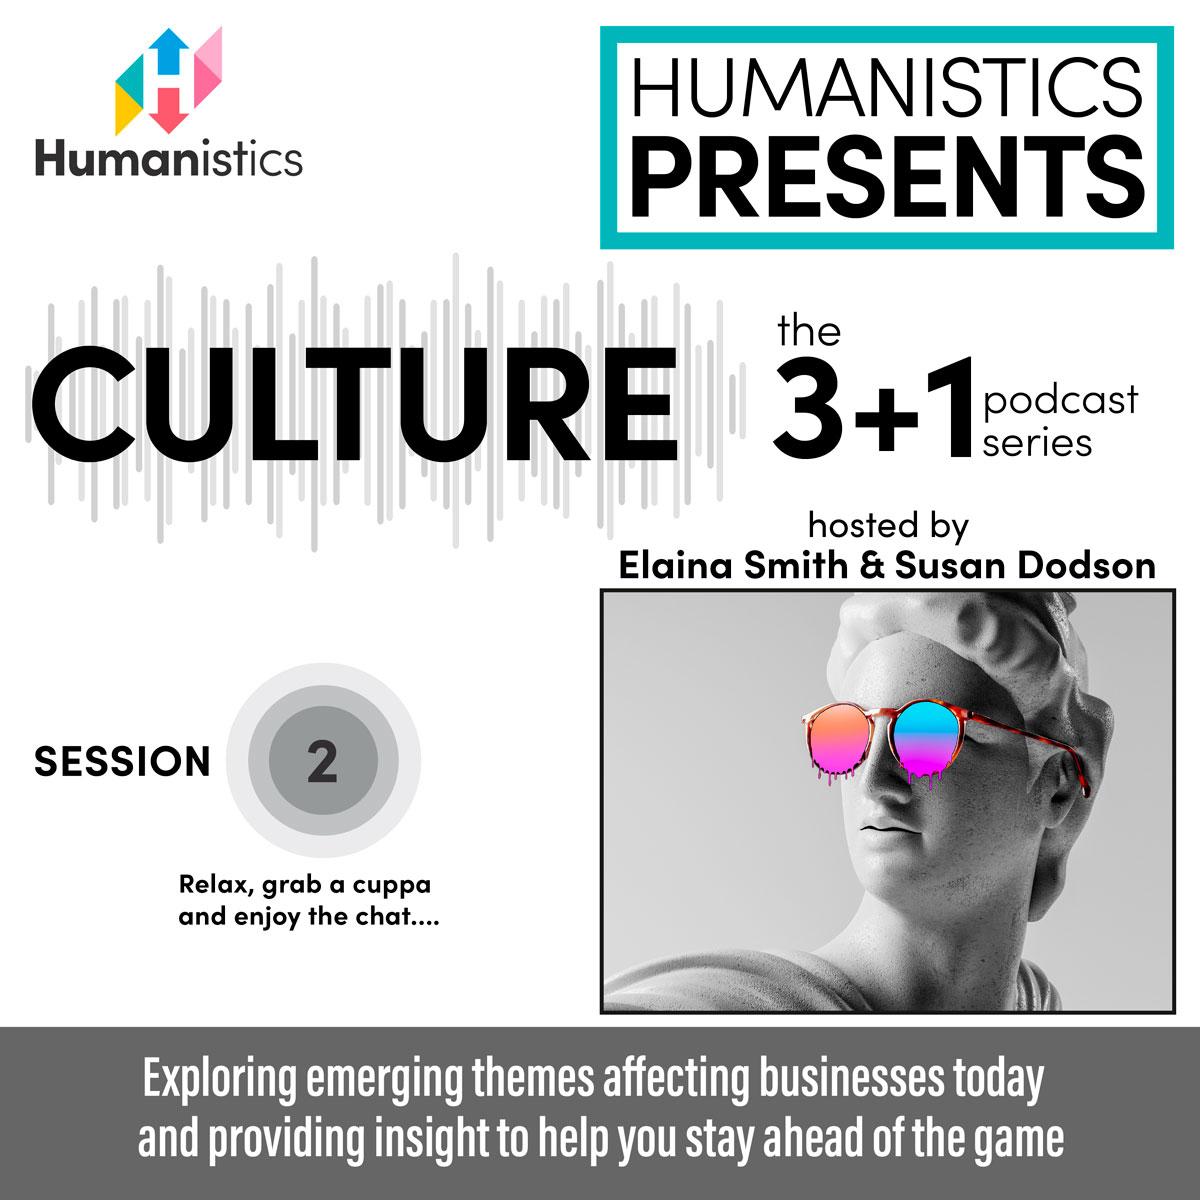 https://humanistics.co.uk/wp-content/uploads/2021/07/Humanistics-Leadership-Podcast-Culture.jpg